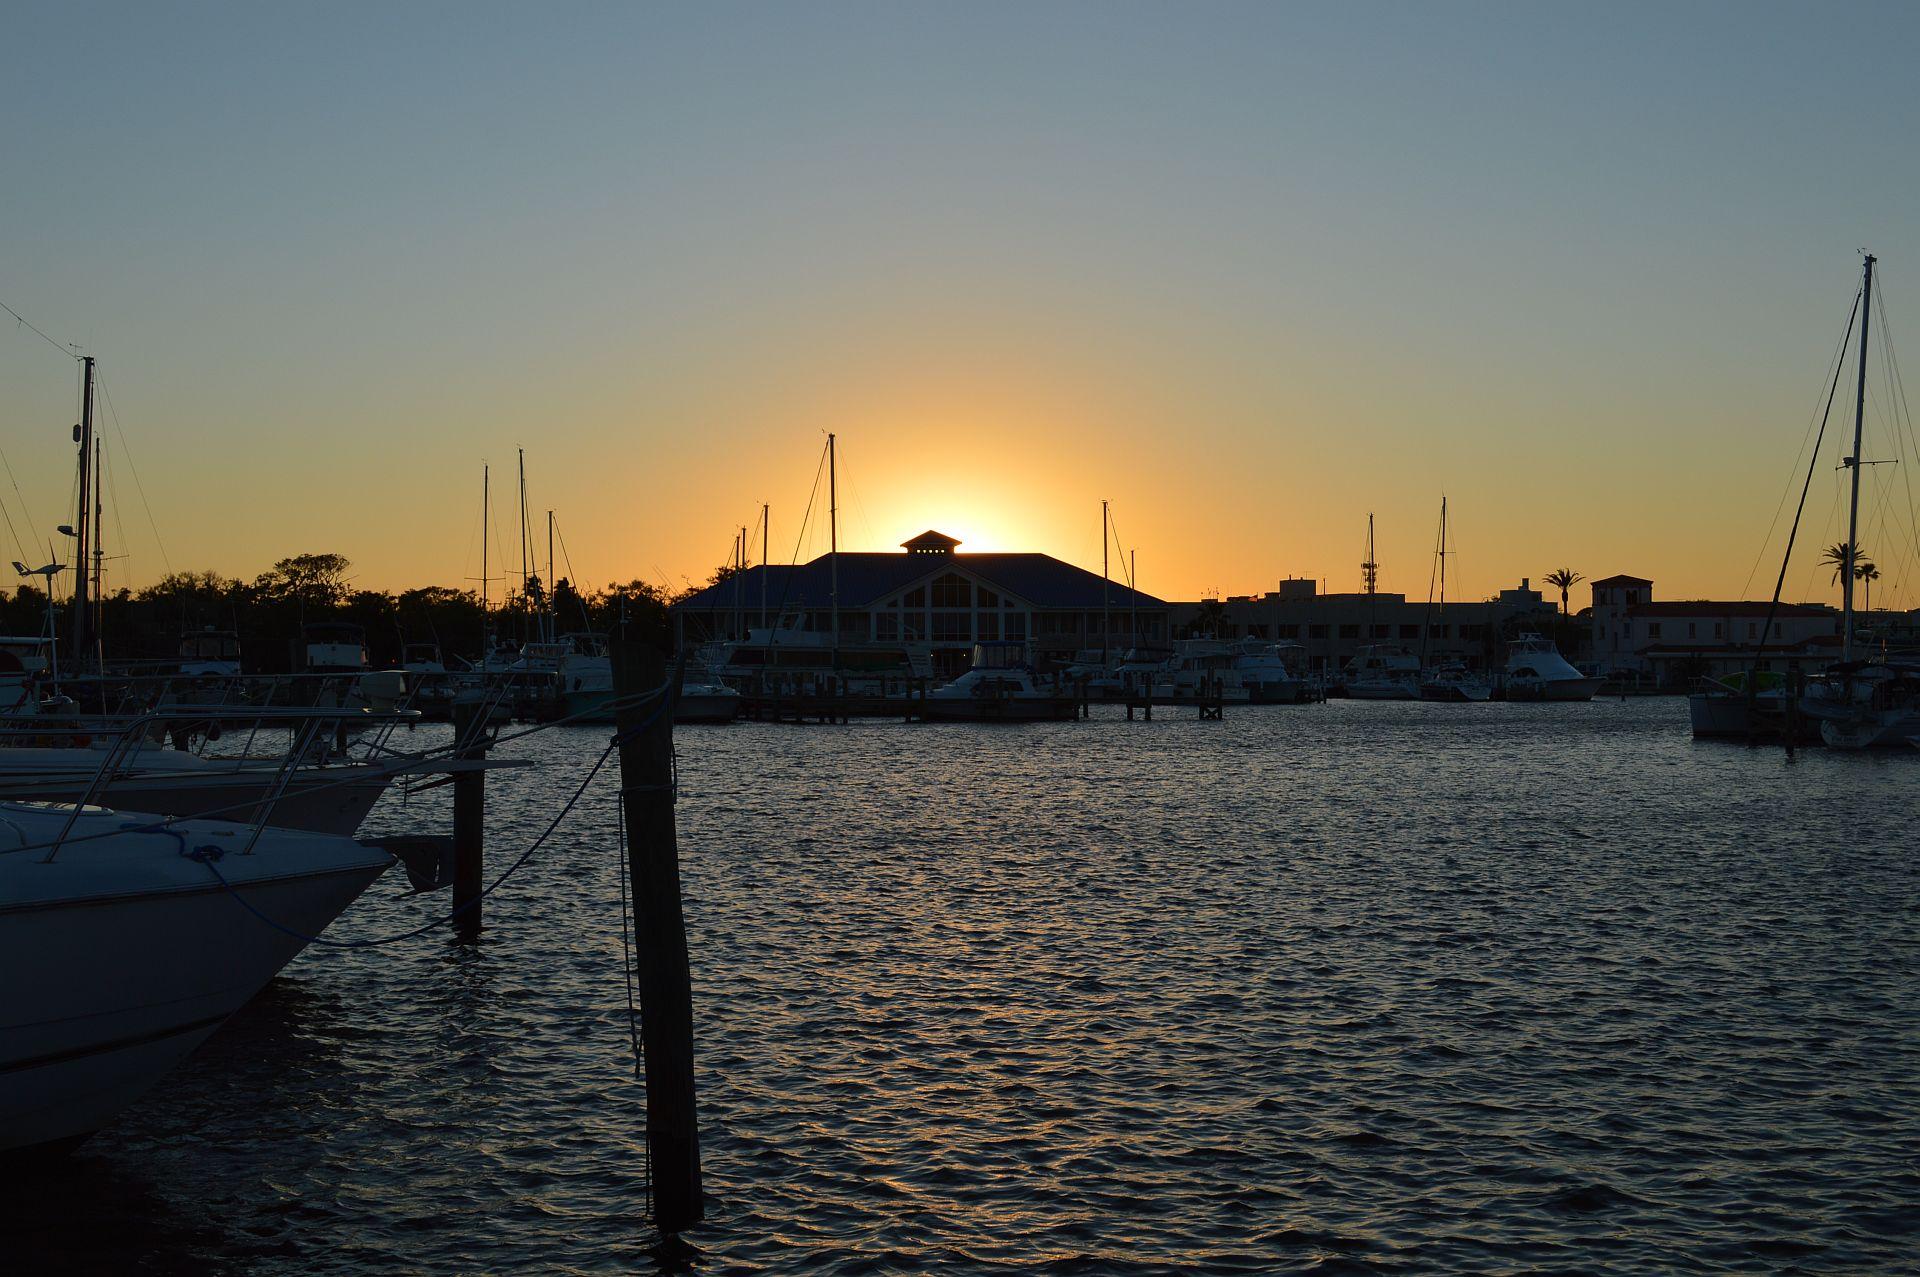 Halifax River Yacht Club at Sunset